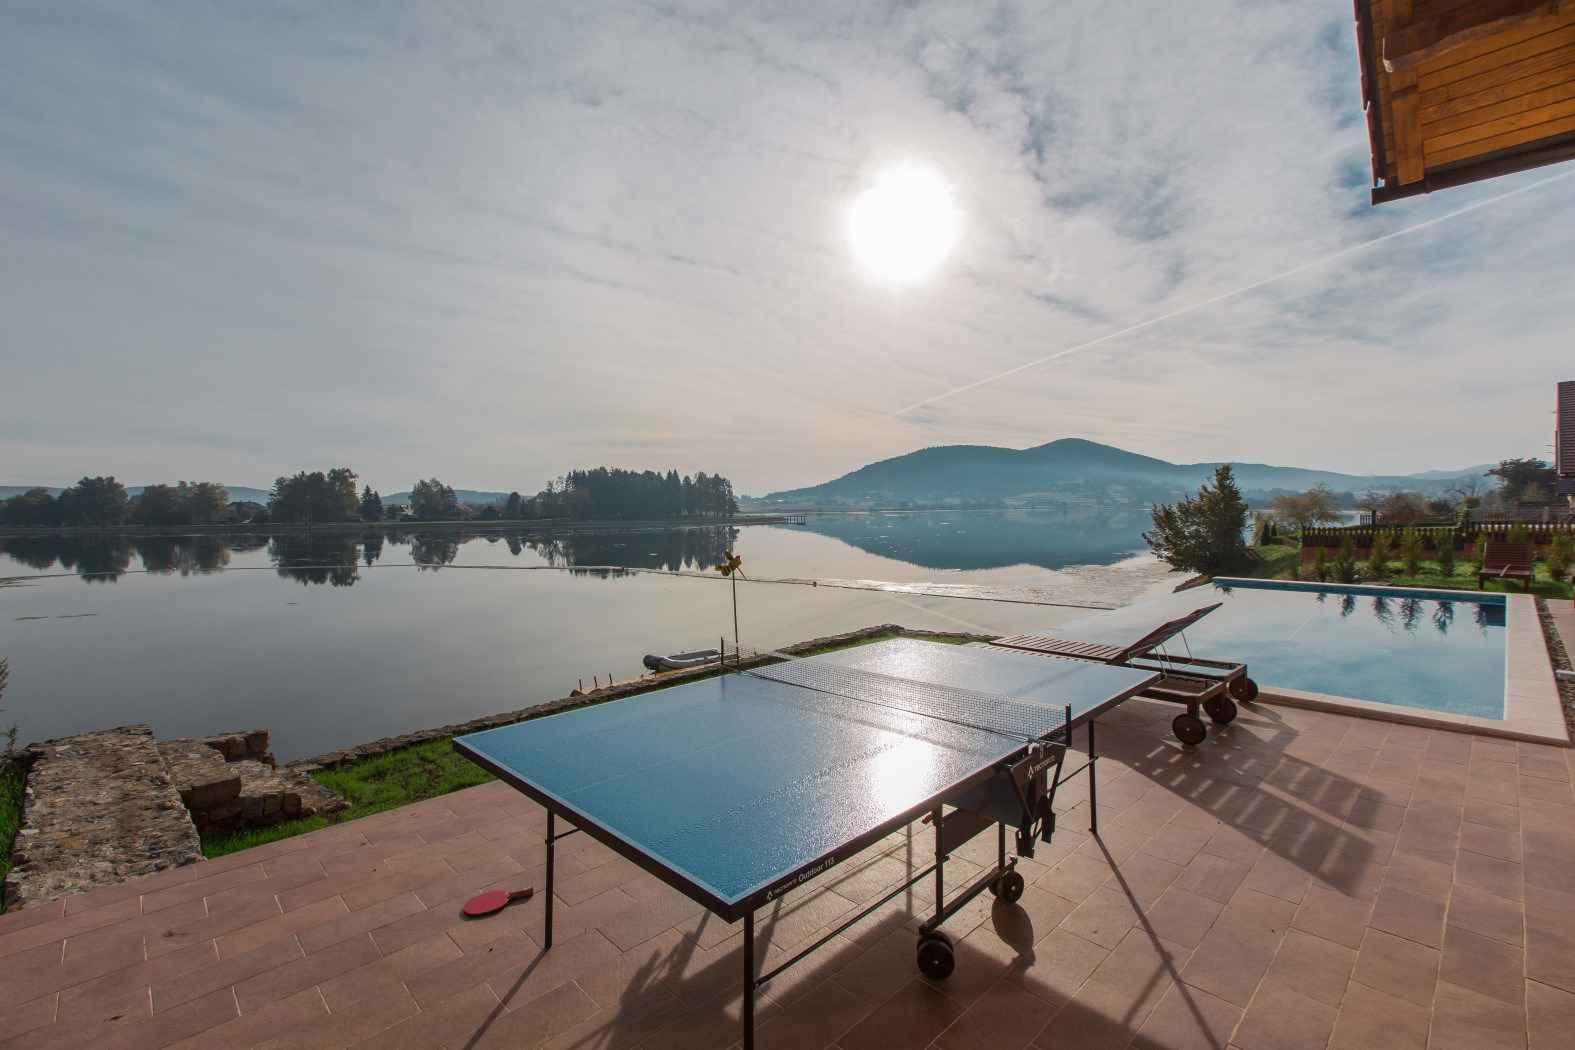 Ferienhaus mit Pool am See gelegen (2047240), Ogulin, , Mittelkroatien, Kroatien, Bild 10